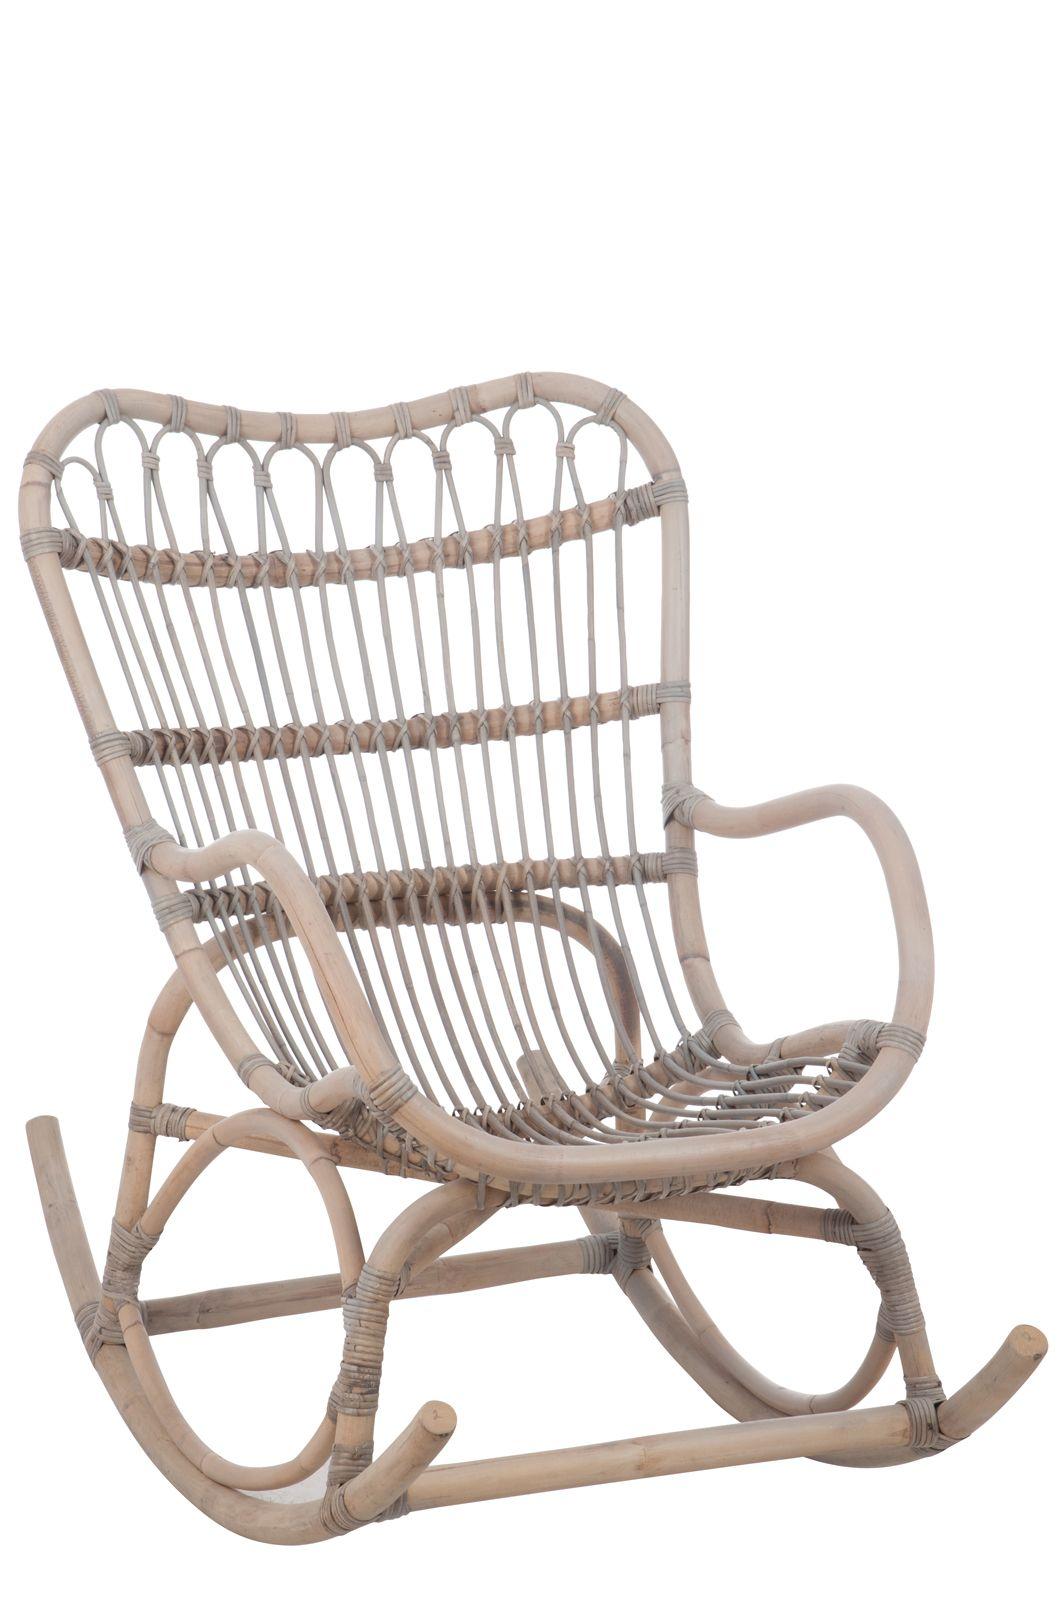 Fauteuil A Bascule En Rotin Rocking Chair Kotecaz Fr Fauteuil A Bascule Fauteuil A Bascule En Rotin Chaise A Bascule